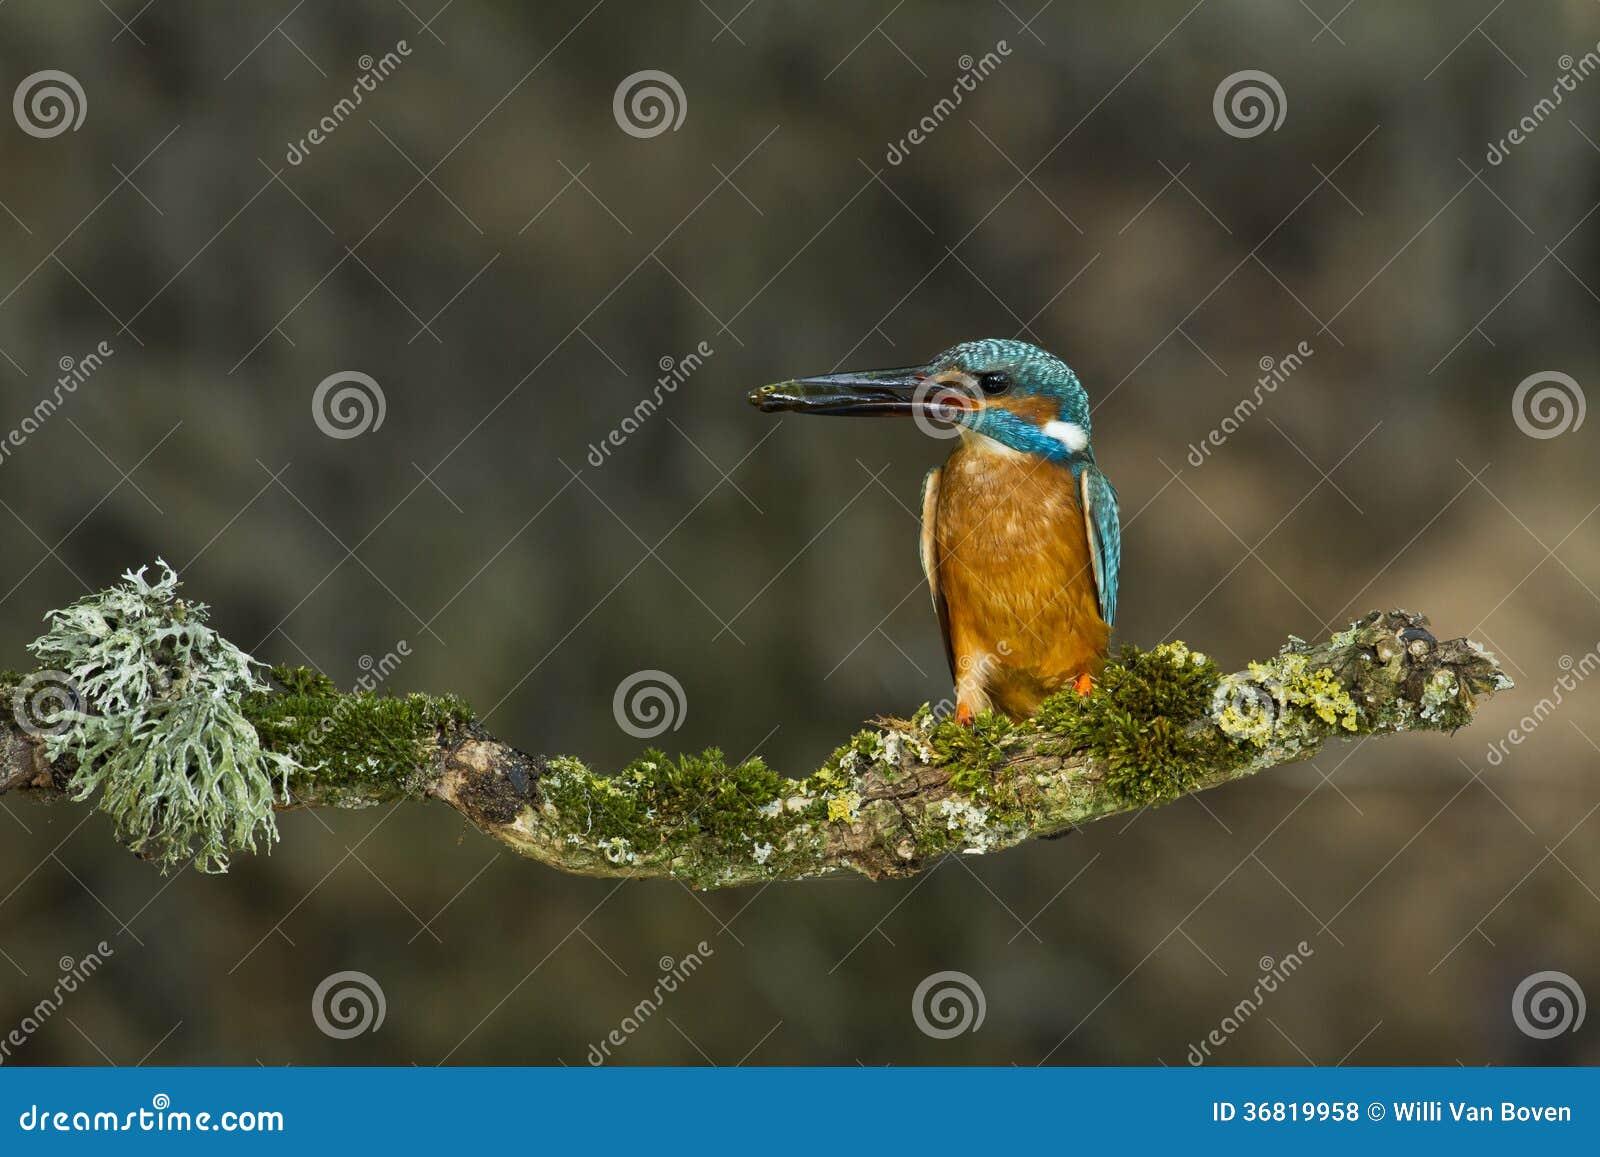 Kingfishers with Ninespine stickleback.